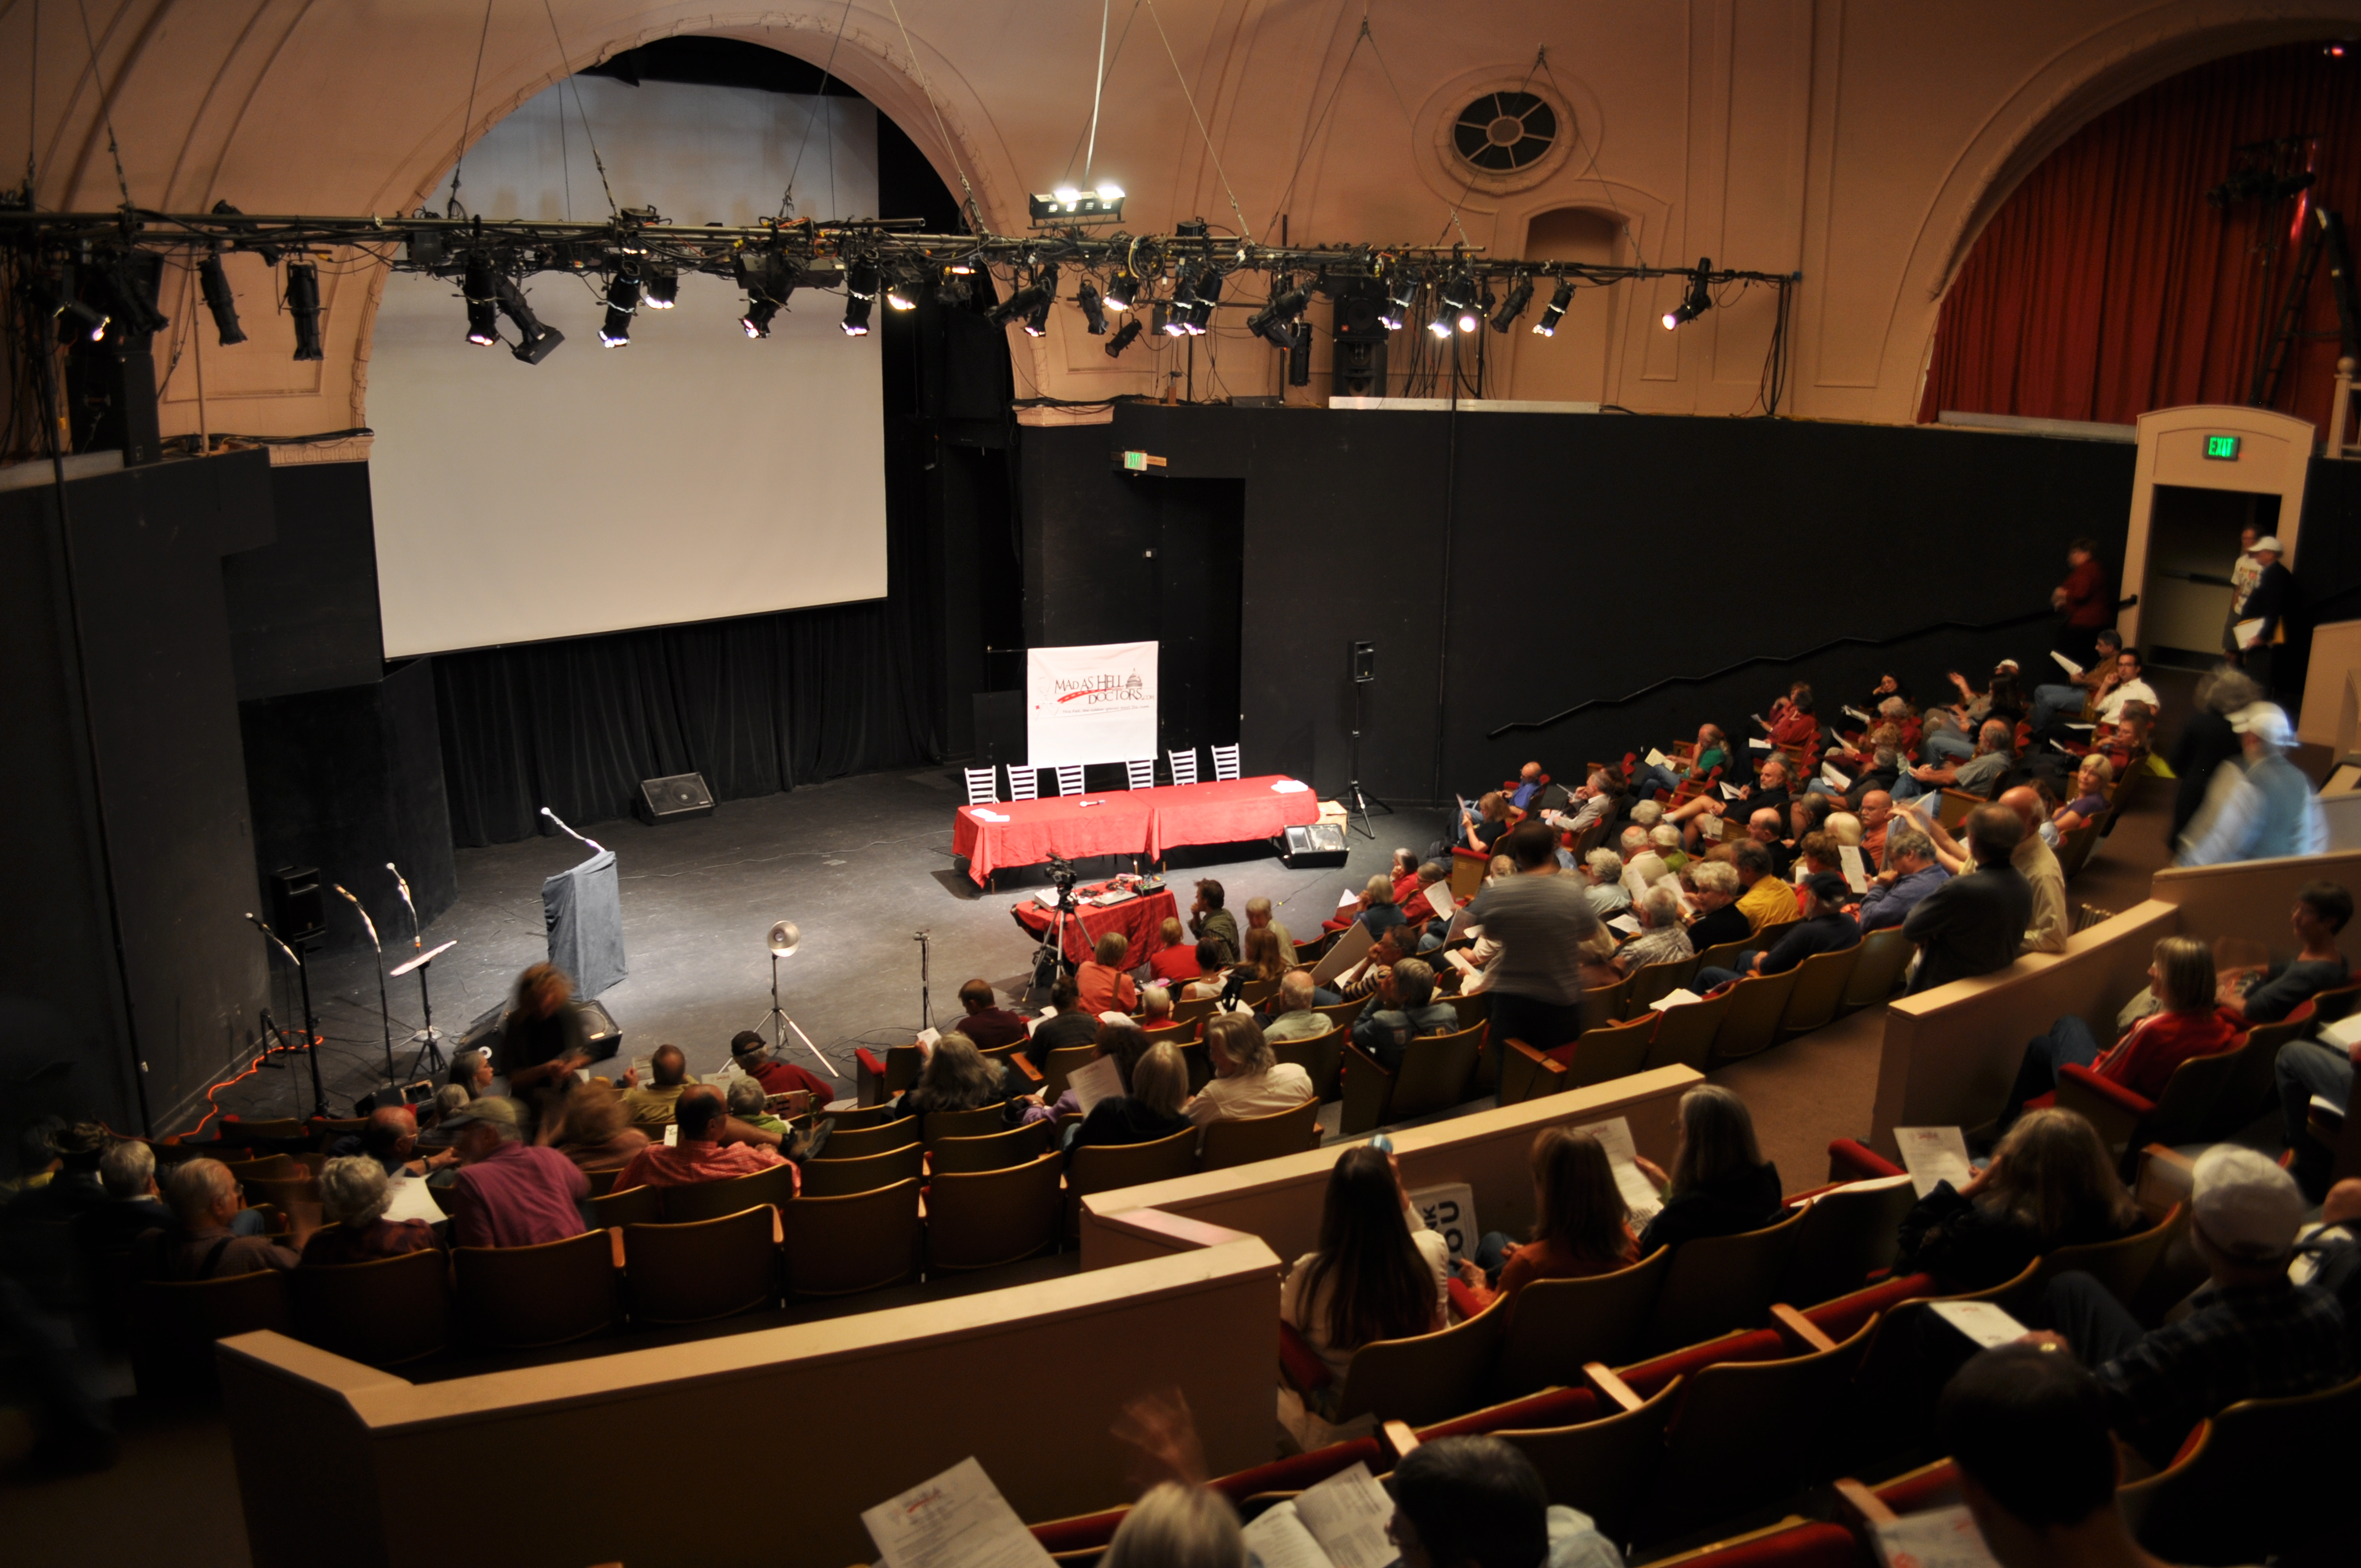 Langston hughes performing arts center for Art institute interior design reviews